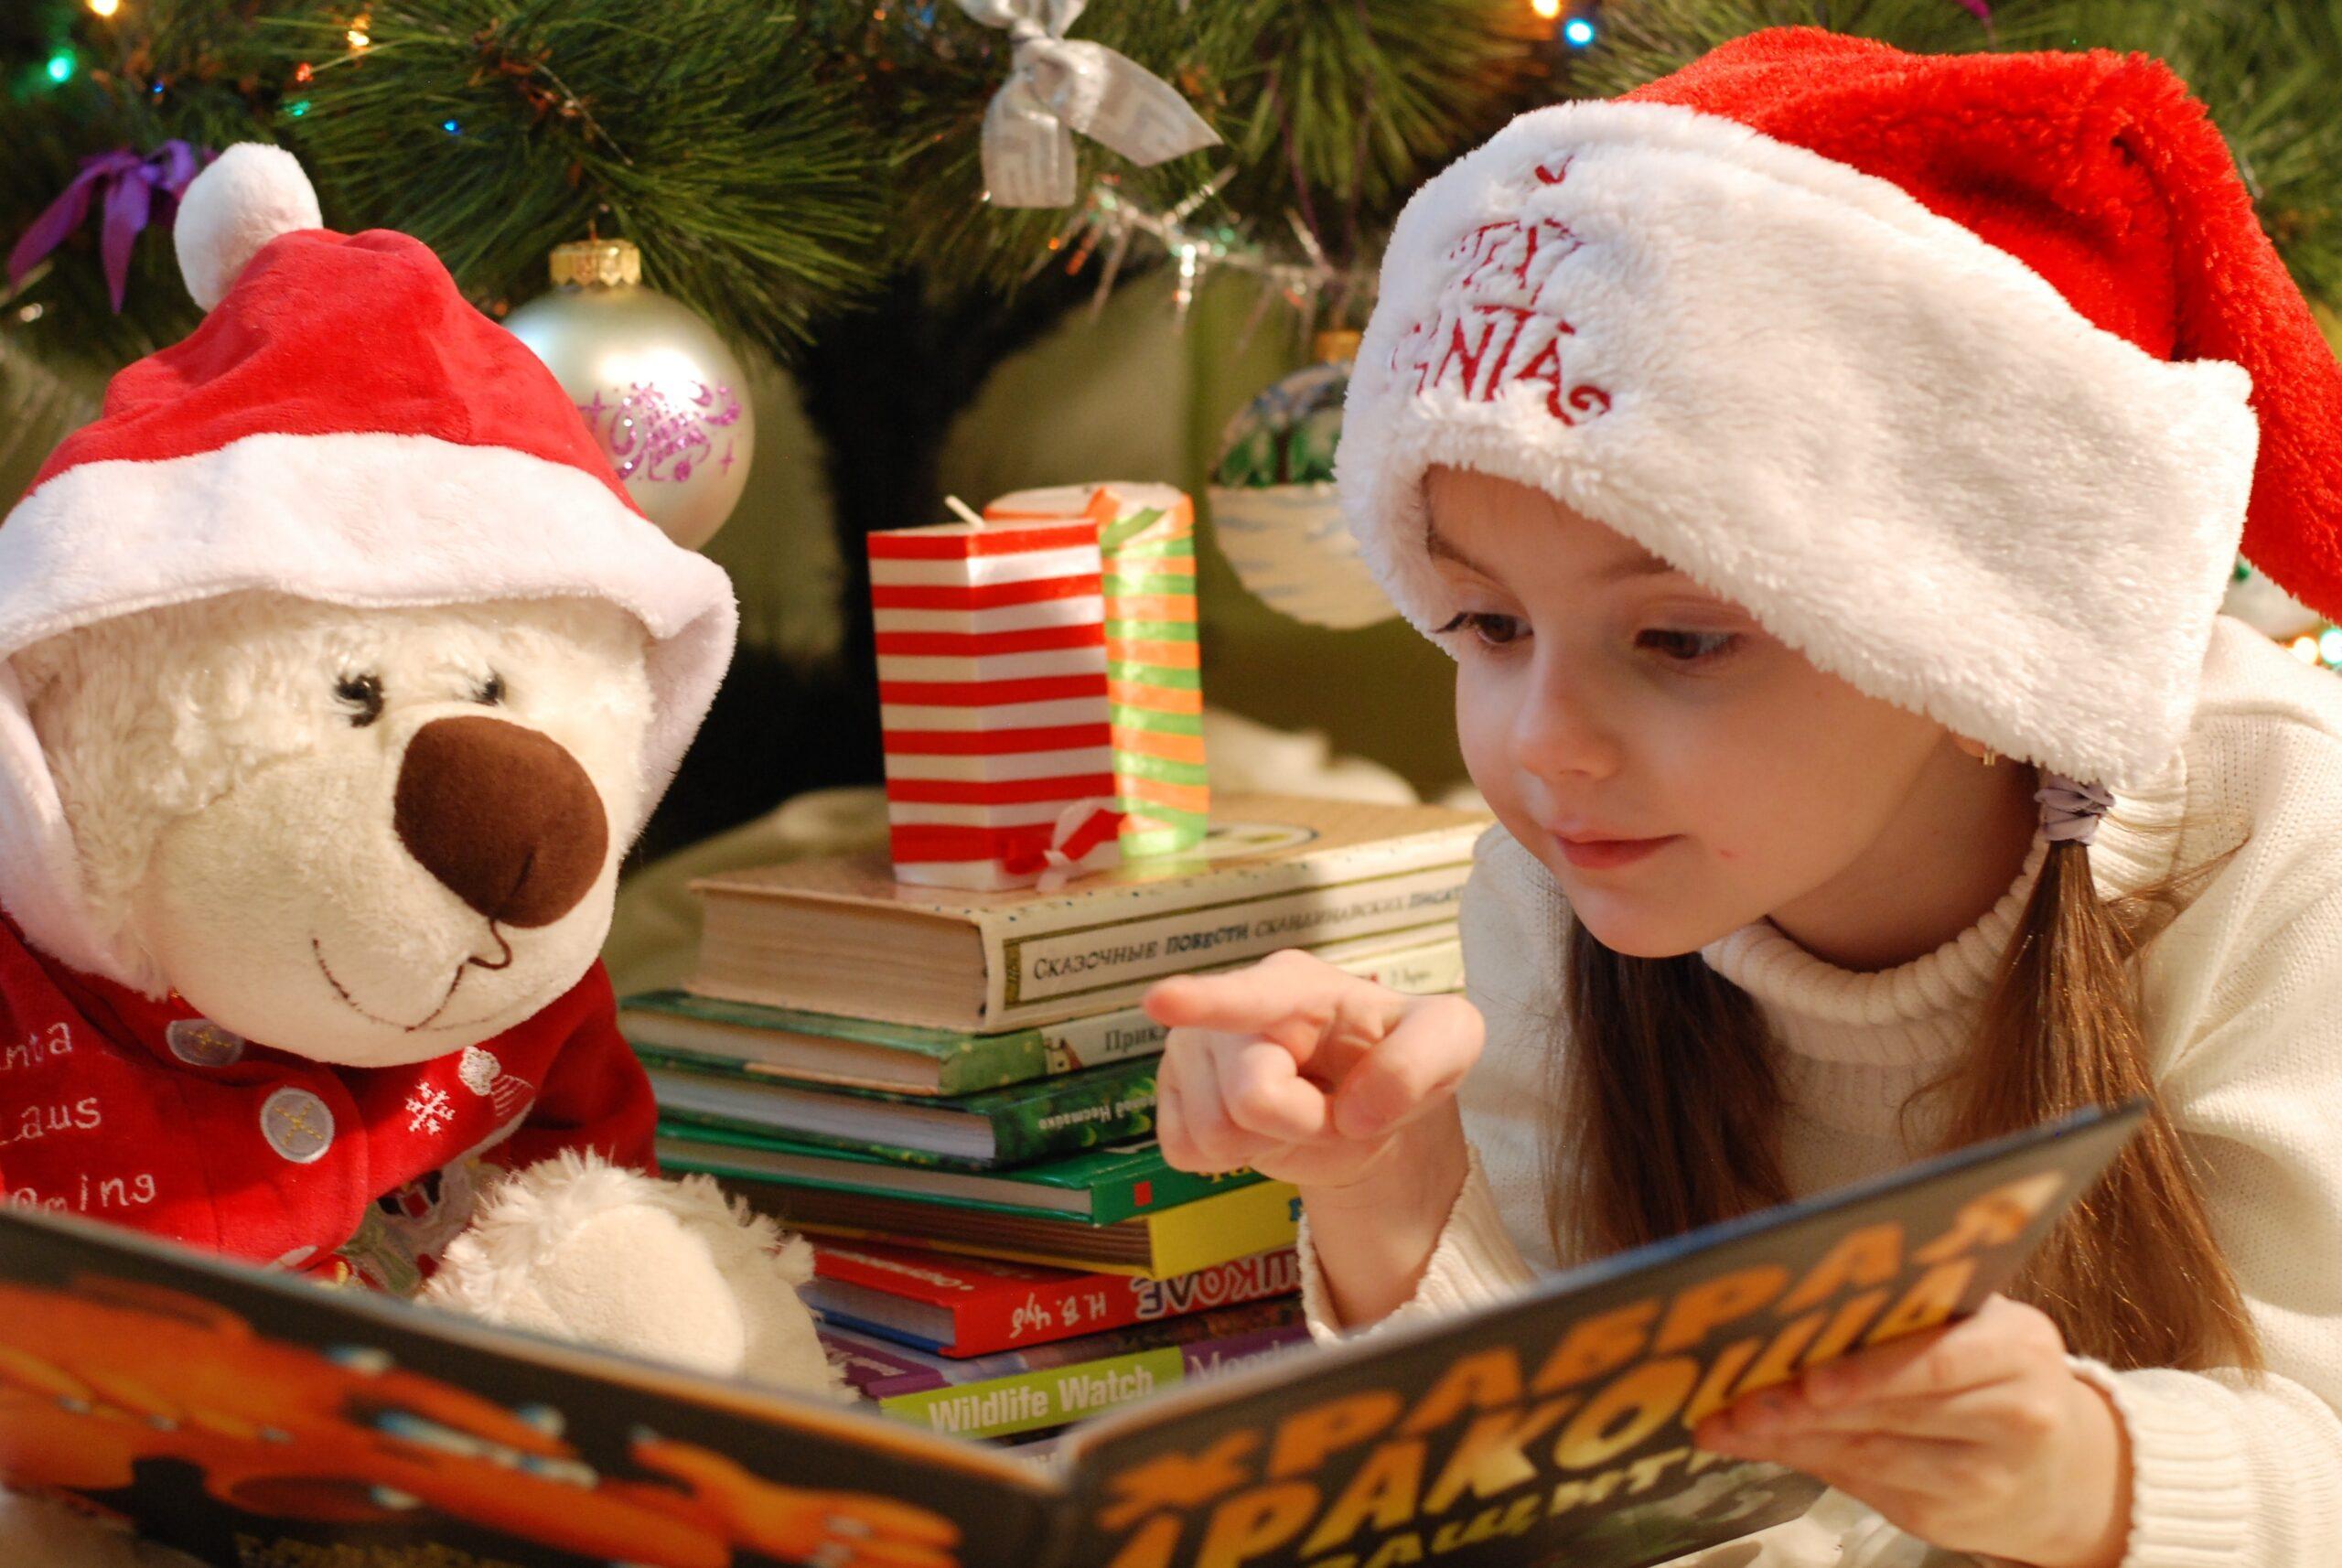 Red Deer Christmas Bureau Society